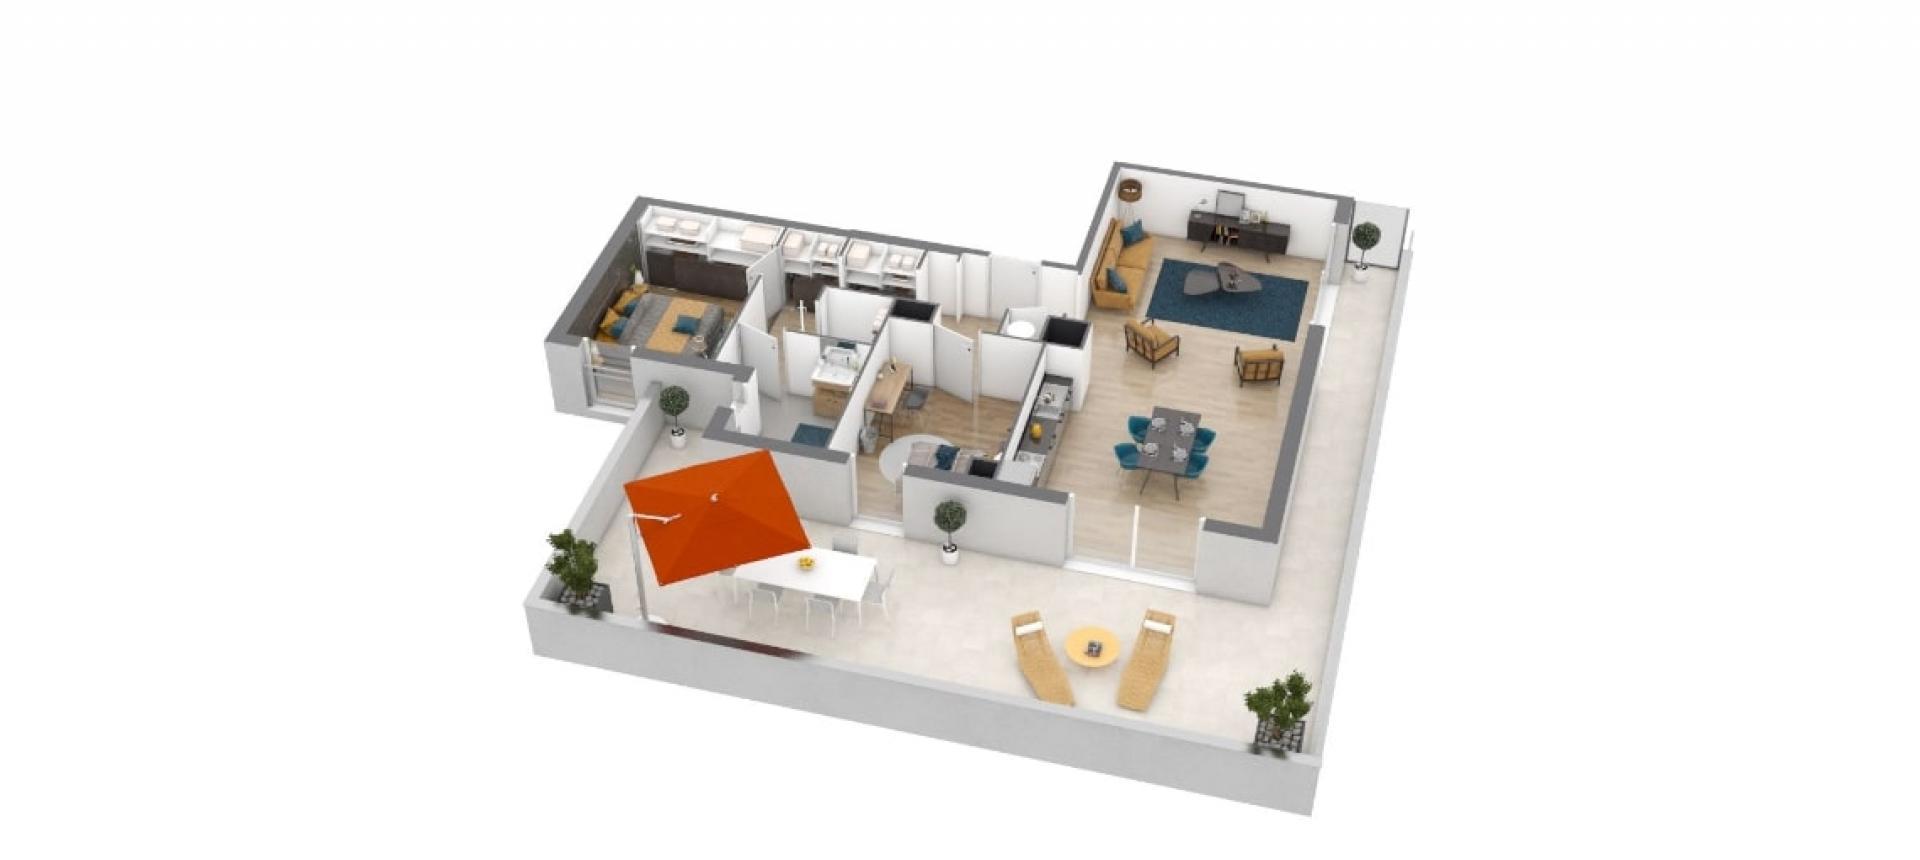 T3 Terrasse de Torretta vue 3D